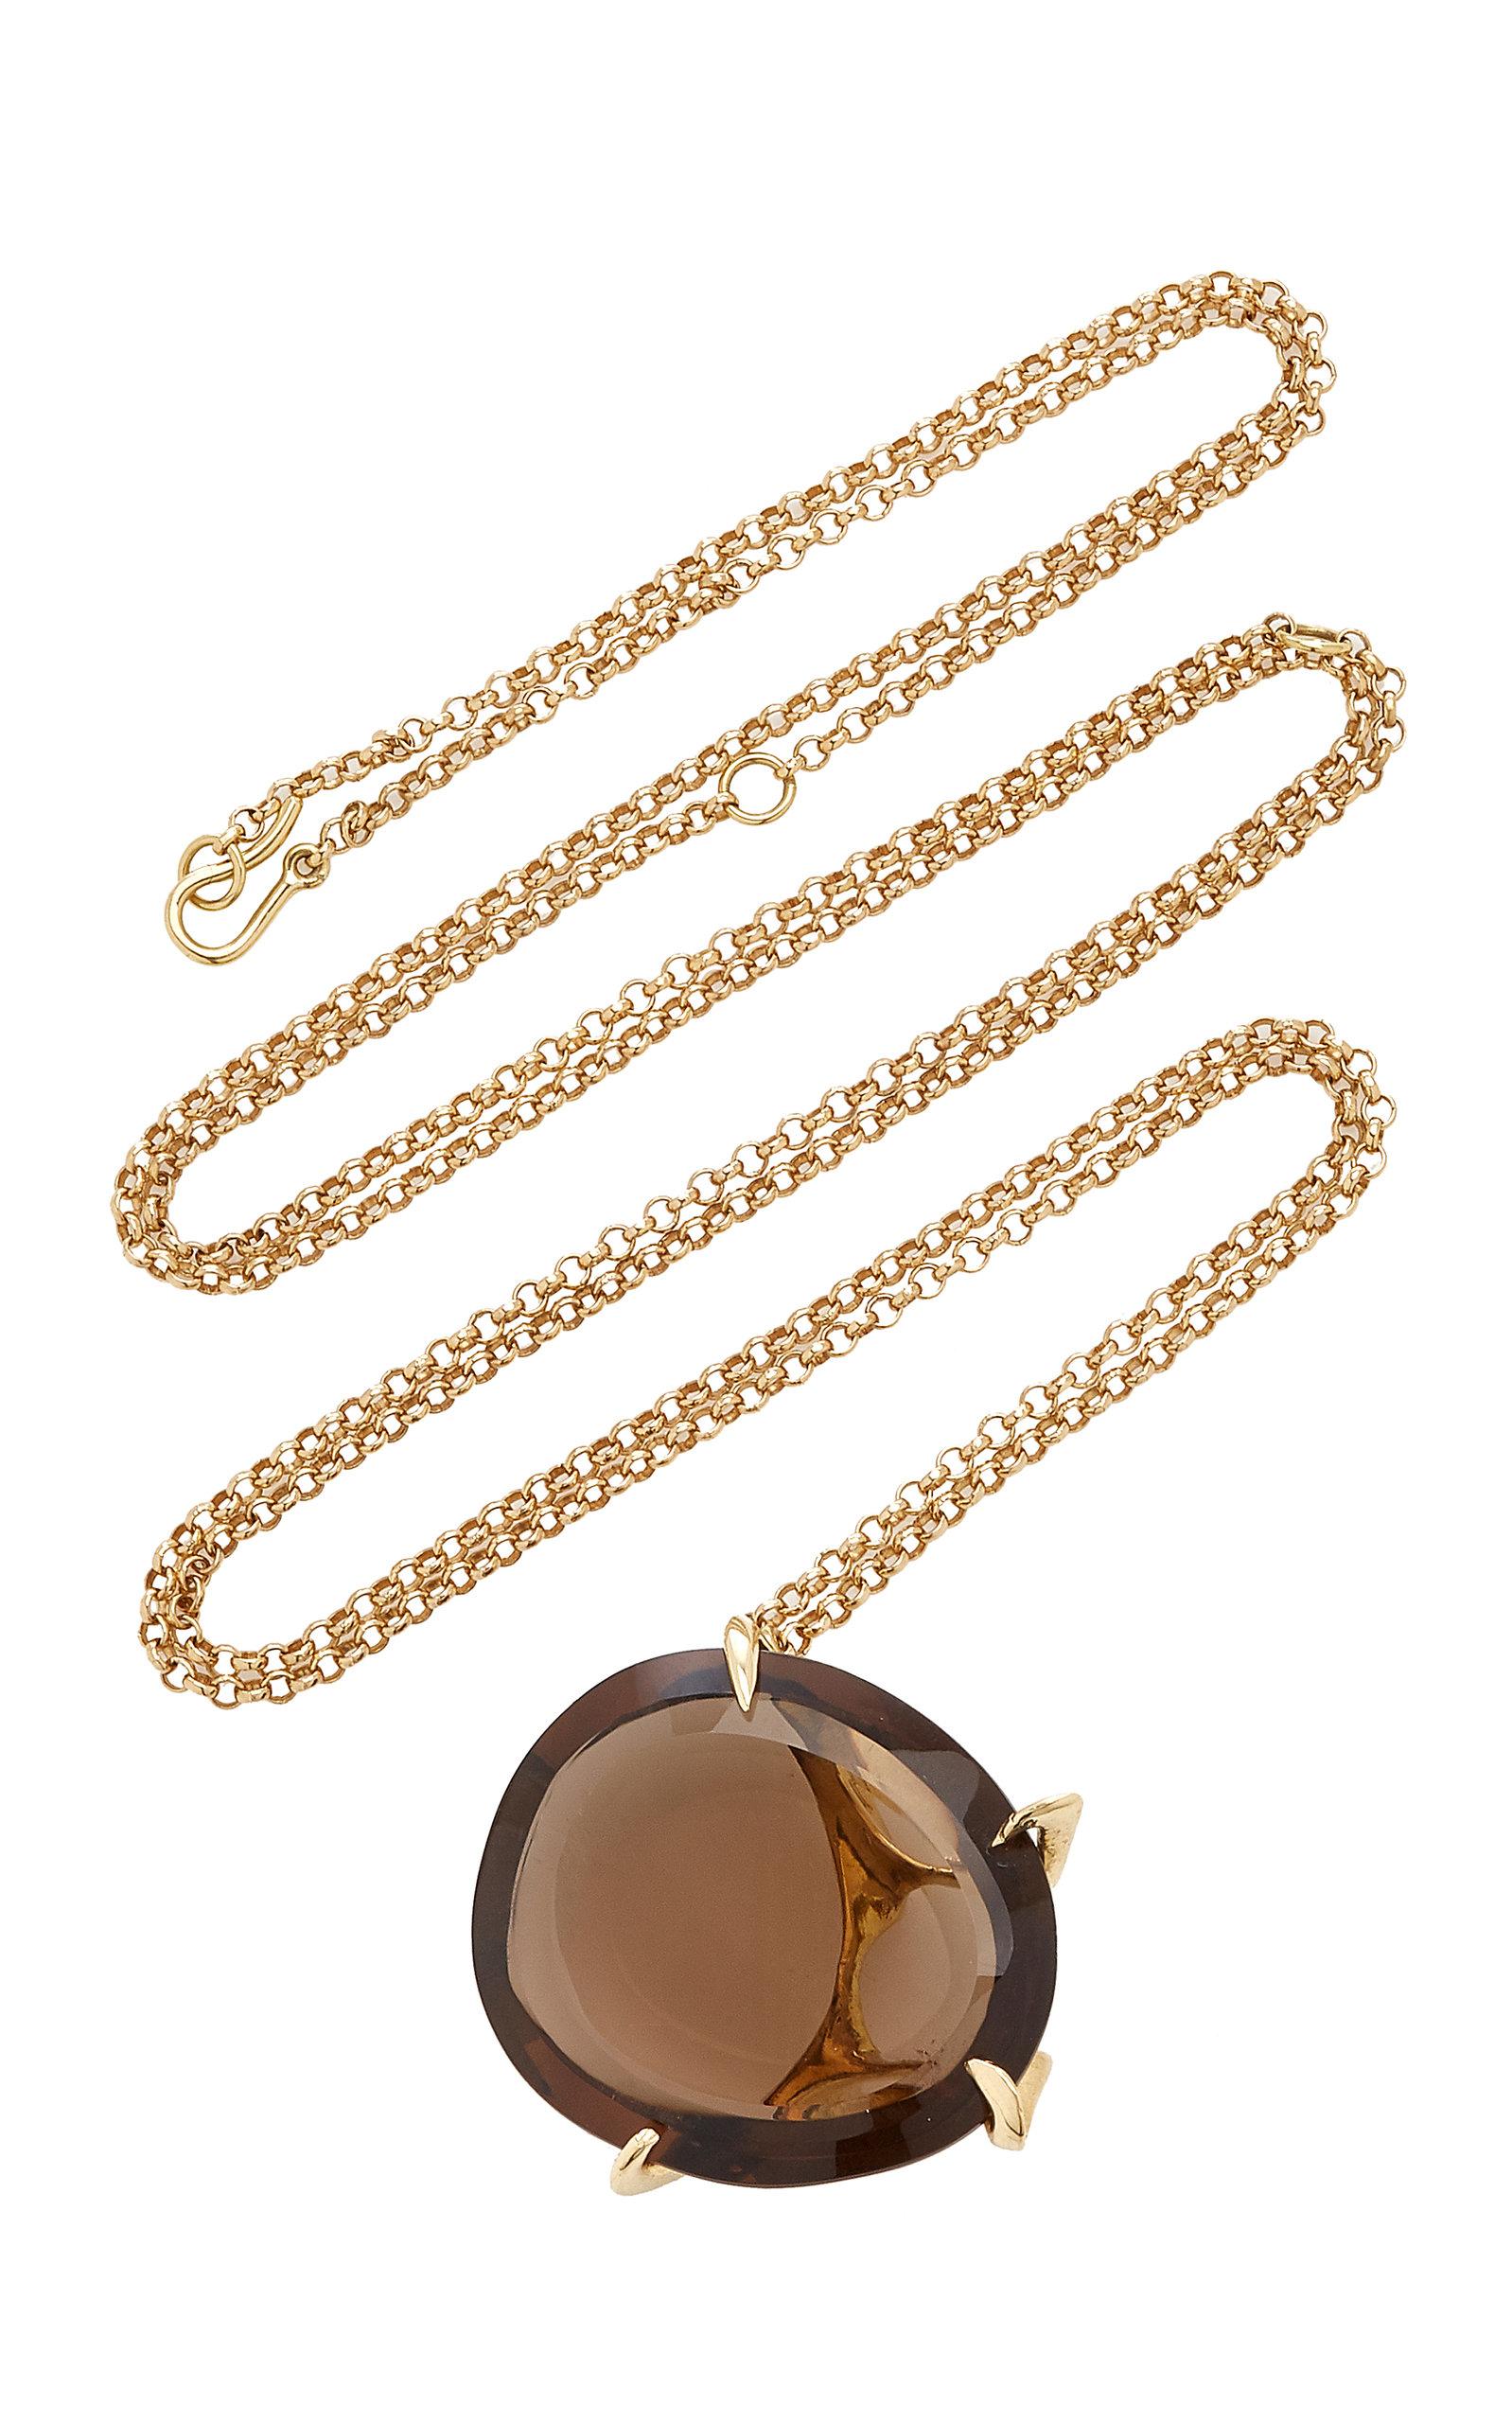 Women's Envolto Quartz 18K Gold Necklace